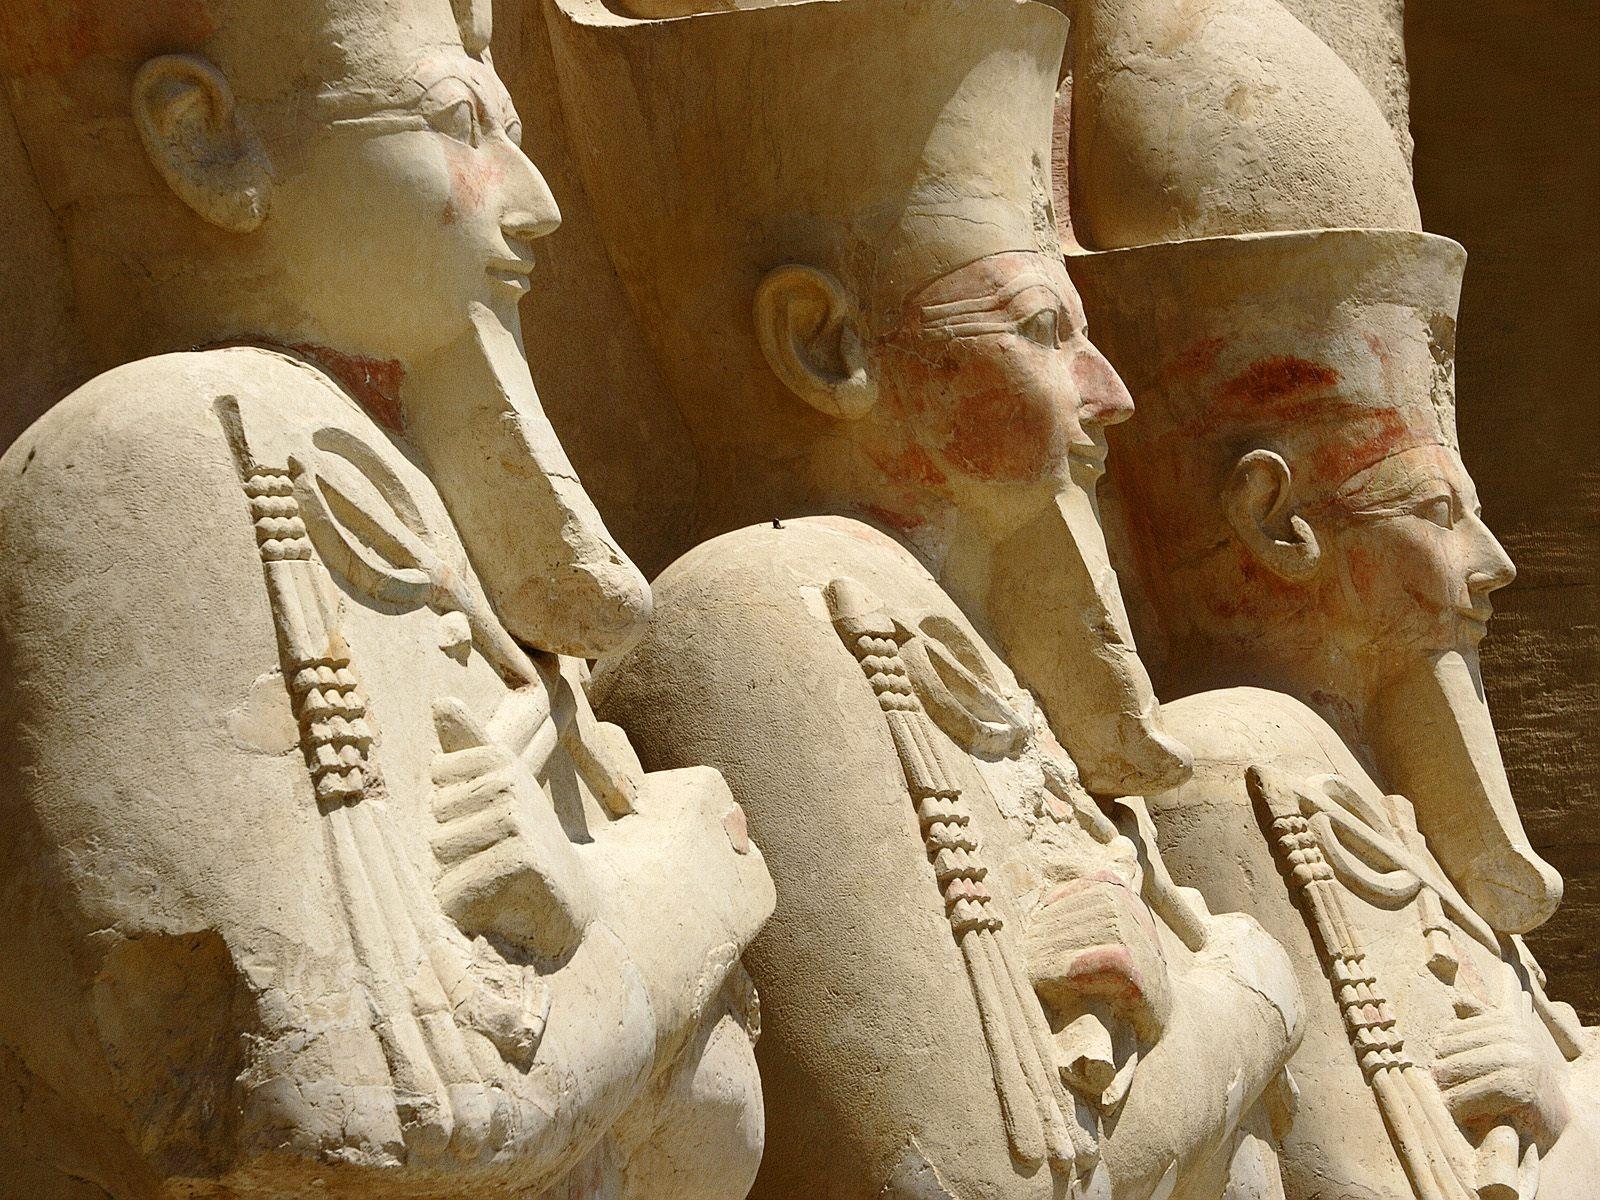 3d Pyramid Wallpaper Temple Of Hatshepsut Wallpaper Egypt World Wallpapers In